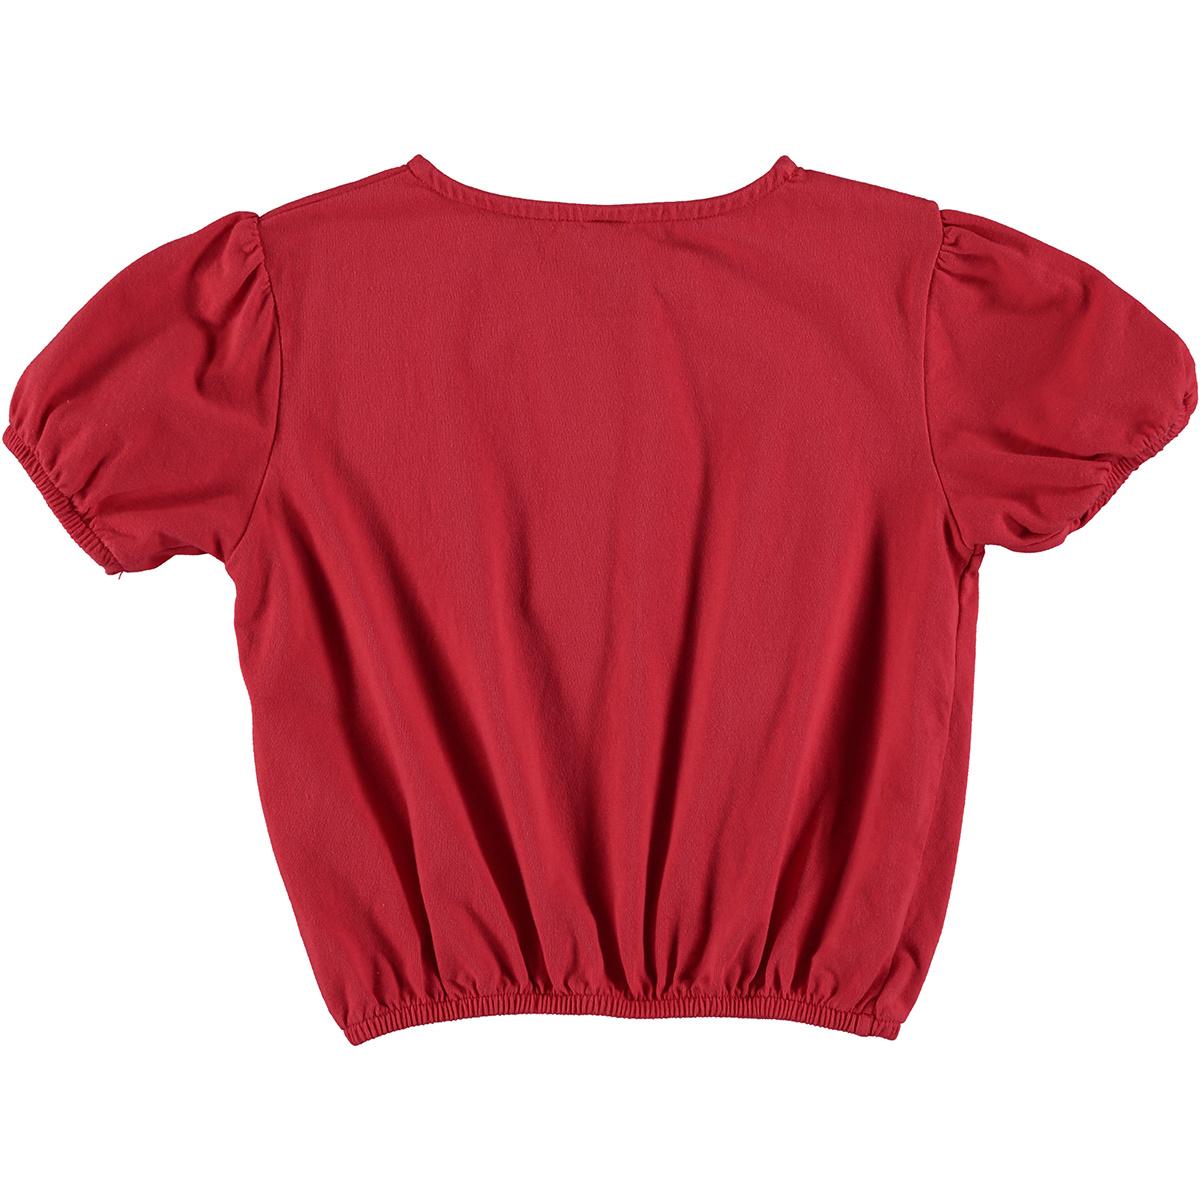 Crop T-shirt baby Bonmot - Red-2